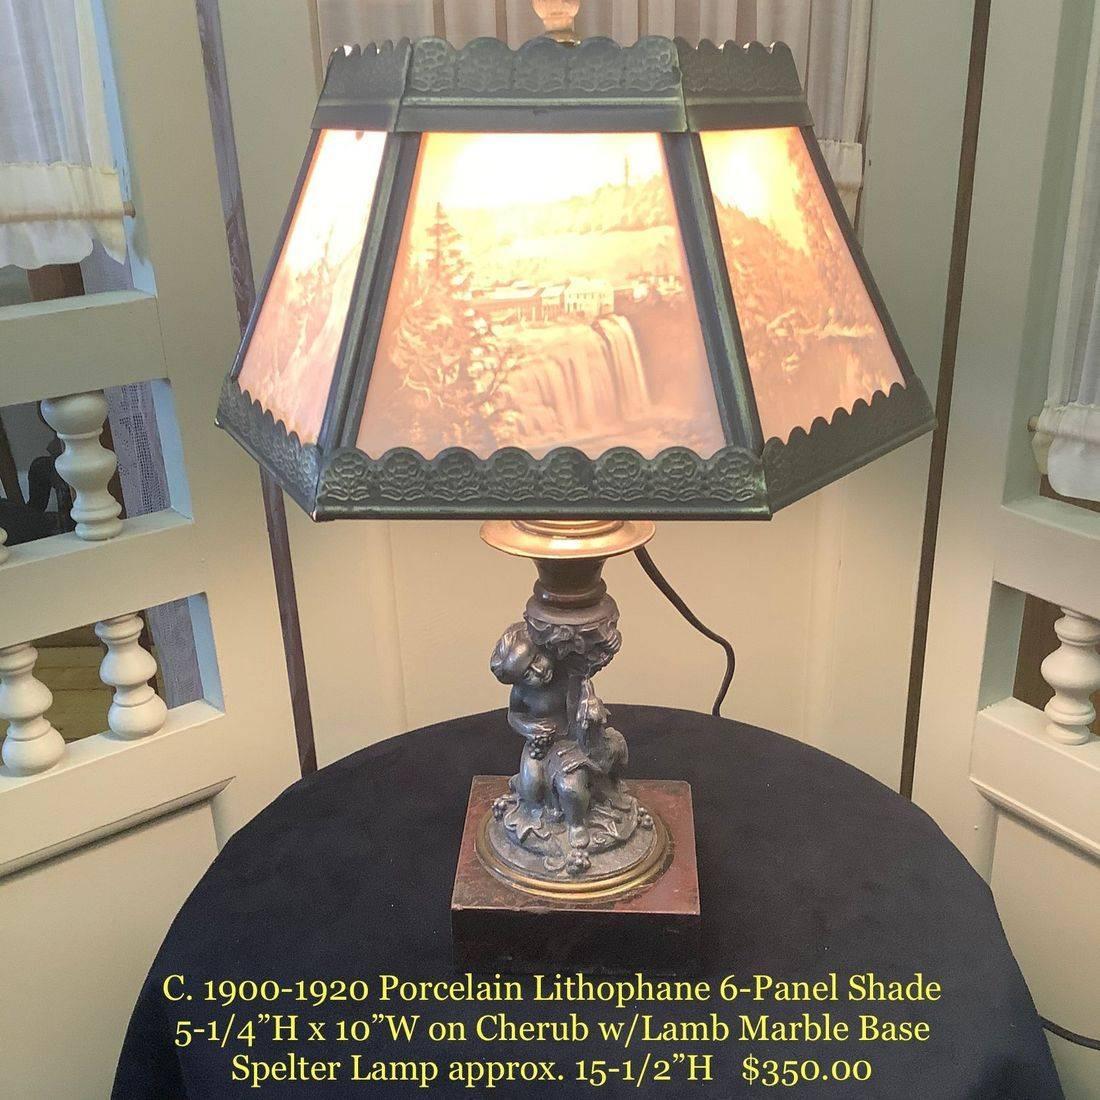 "C. 1900-1910 Porcelain Lithophane 6-Panel Shade on Cherub w/Lamb Marble Base Spelter Lamp  Approx. 15.5""H.   $350.00"